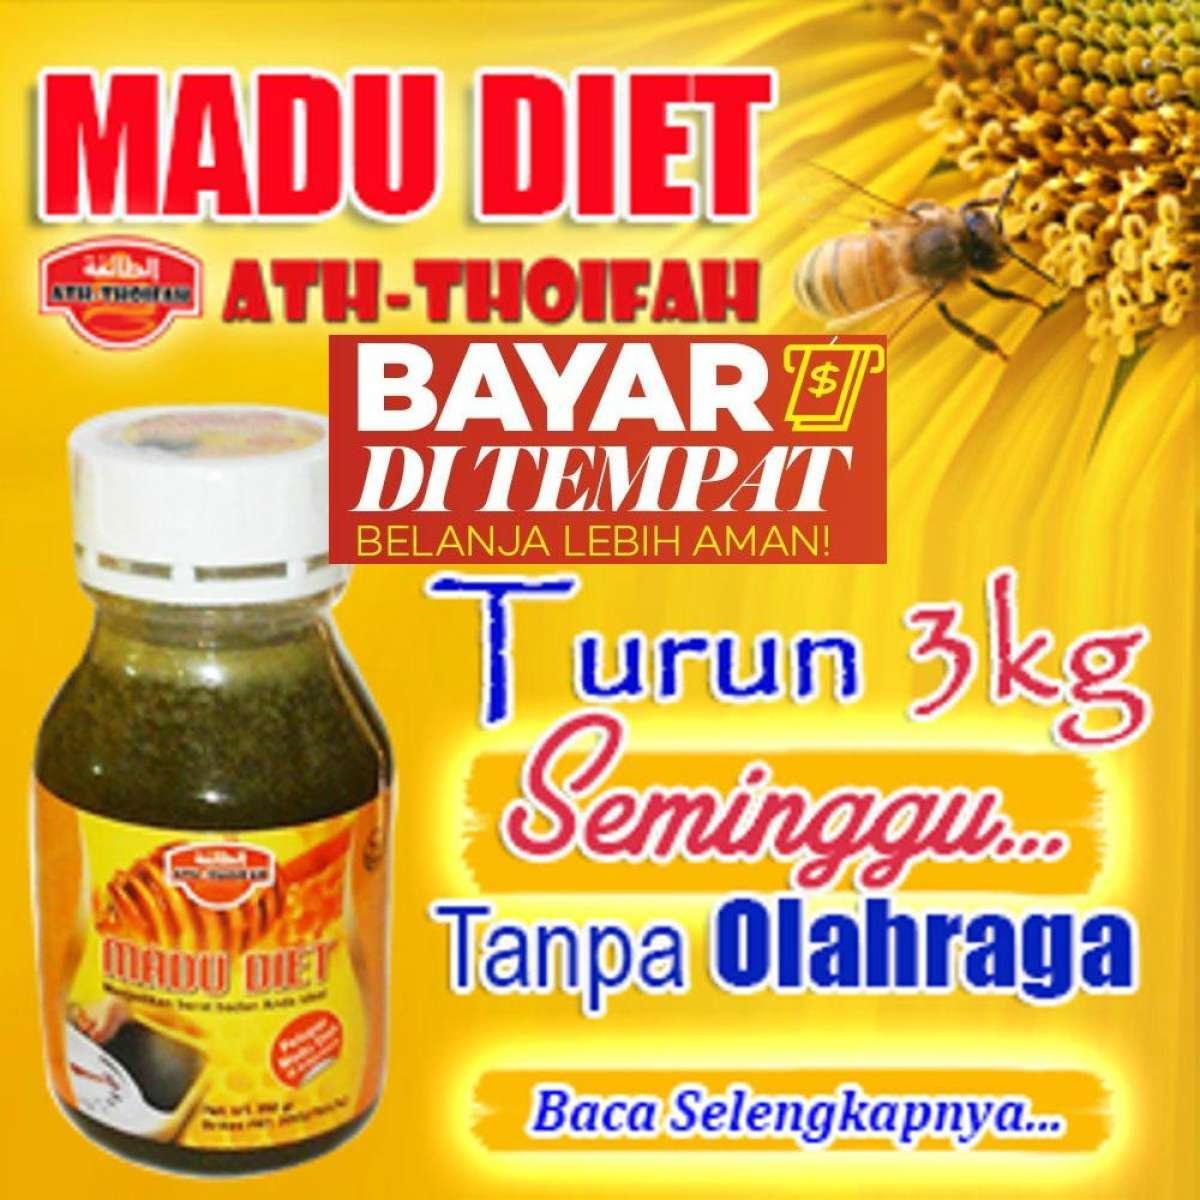 Madu Diet Ampuh - Madu Langsing - Madu Pelangsing Badan 350gr - Madu  Pelangsing Alami bece45f11a